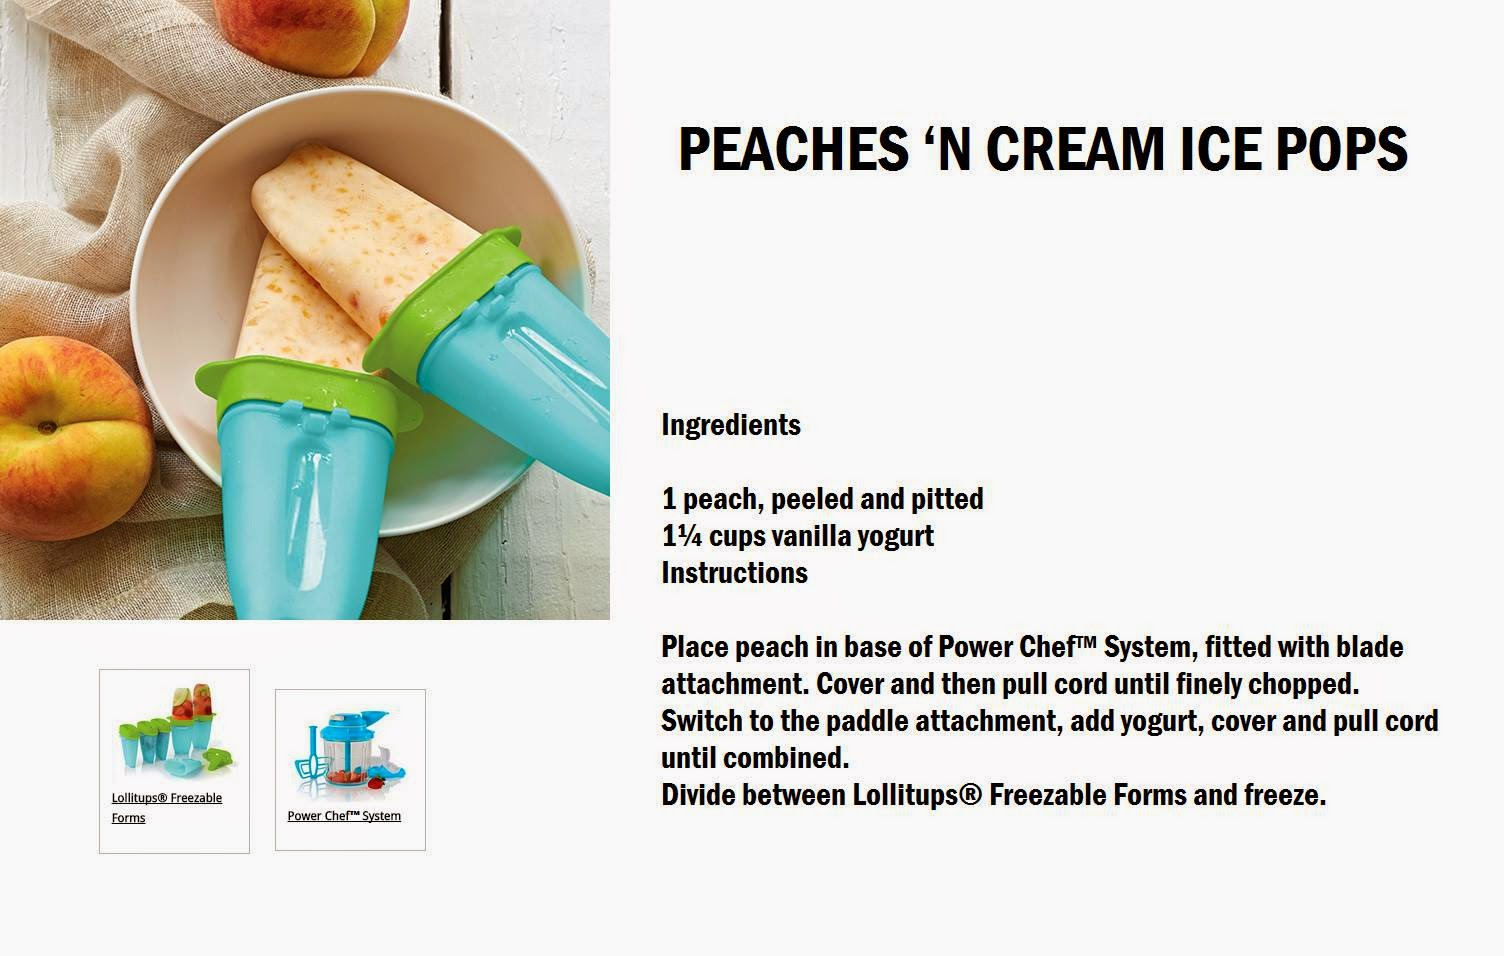 Easy Recipes: Peaches N' Cream Ice Pops